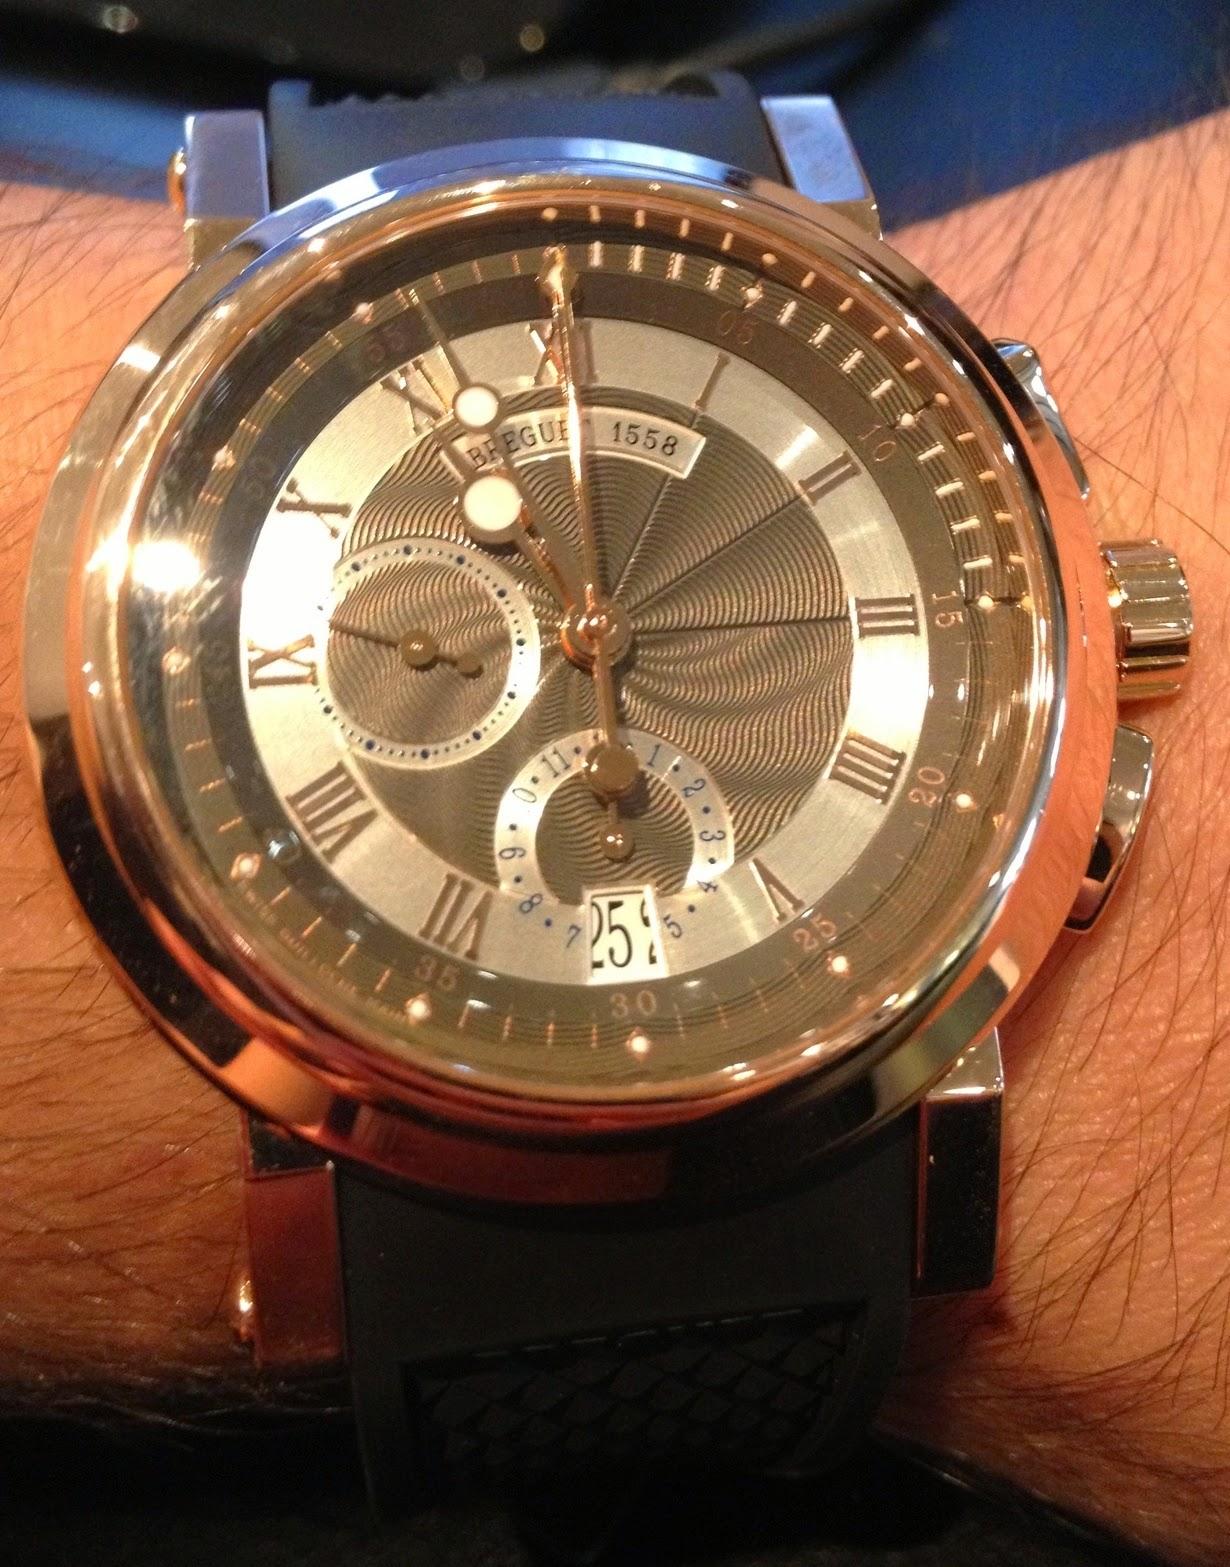 Montre Breguet Marine Chronographe